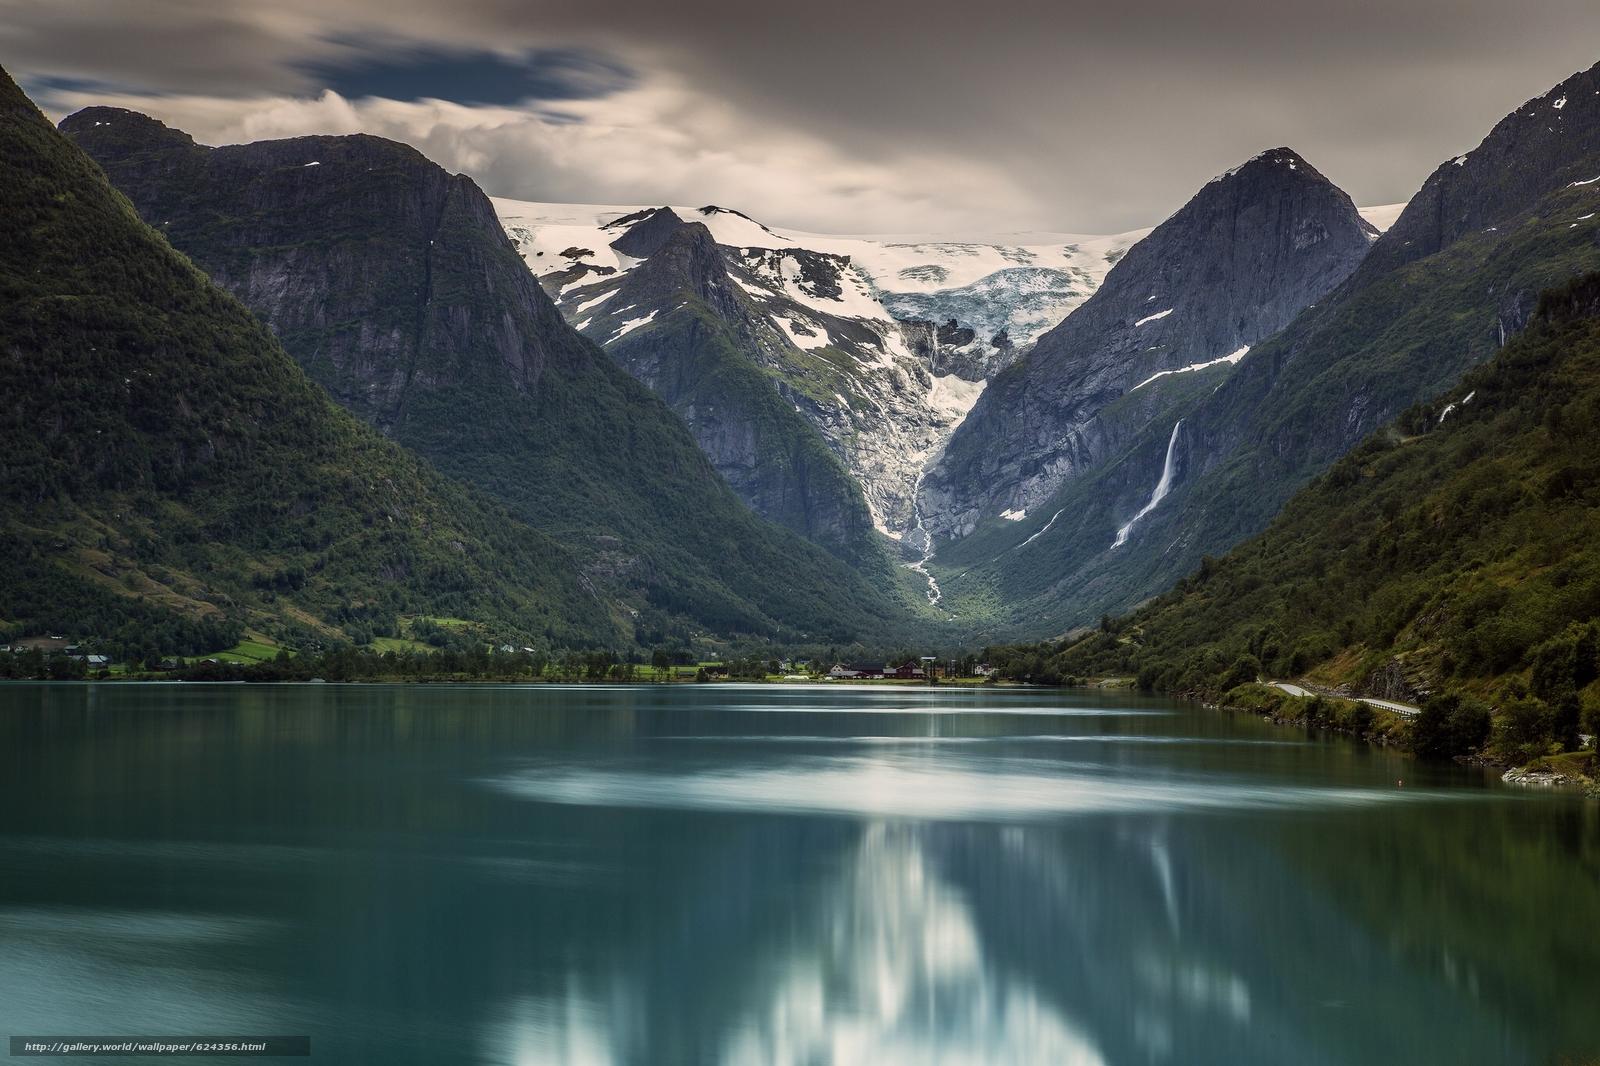 Briksdalsbreen, Briksdal glacier, Jostedalsbreen National Park, Stryn, Norway, Ледник Бриксдаль, Национальный парк Йостедалсбреен, Стрюн, Норвегия, озеро, горы